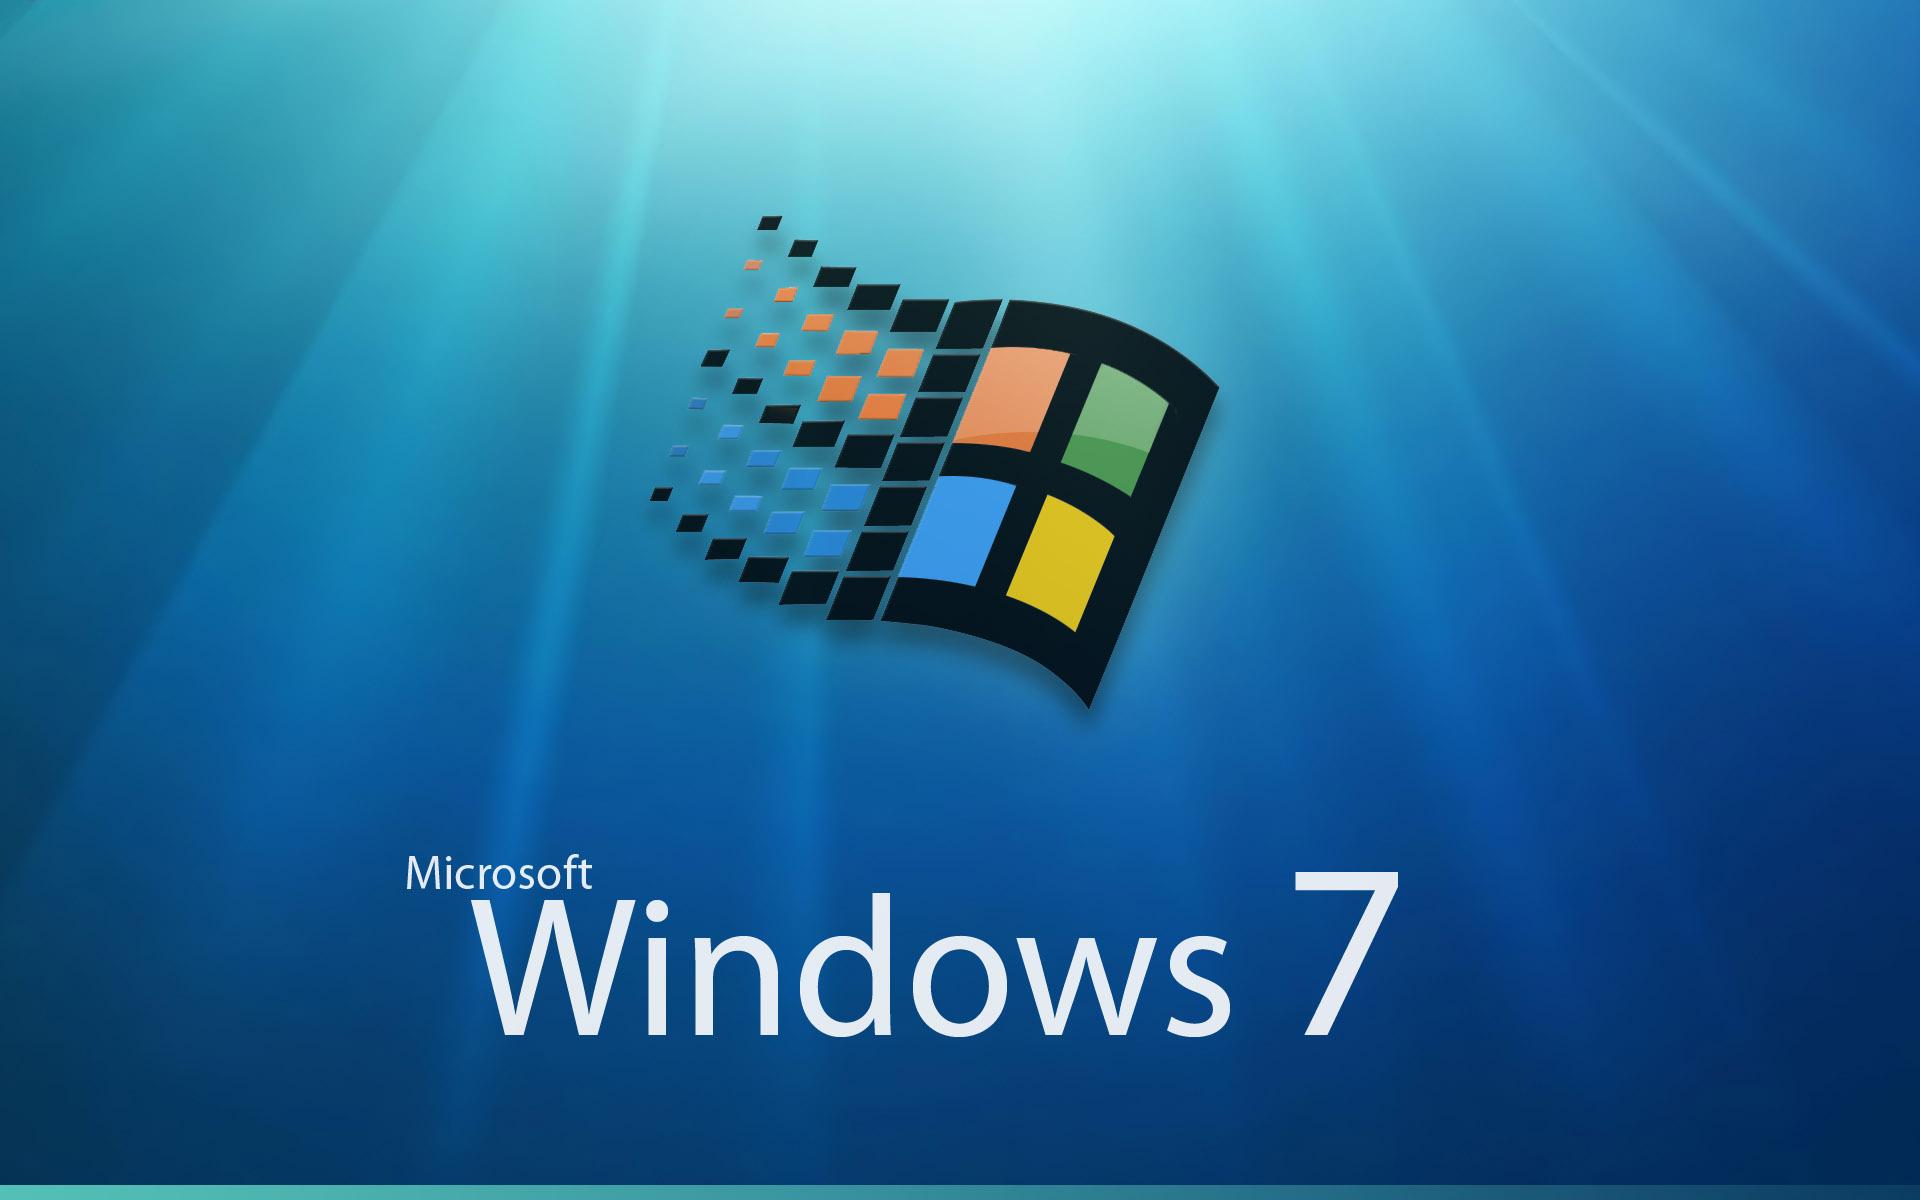 Free download Microsoft Windows 7 logo photo Microsoft Windows 7